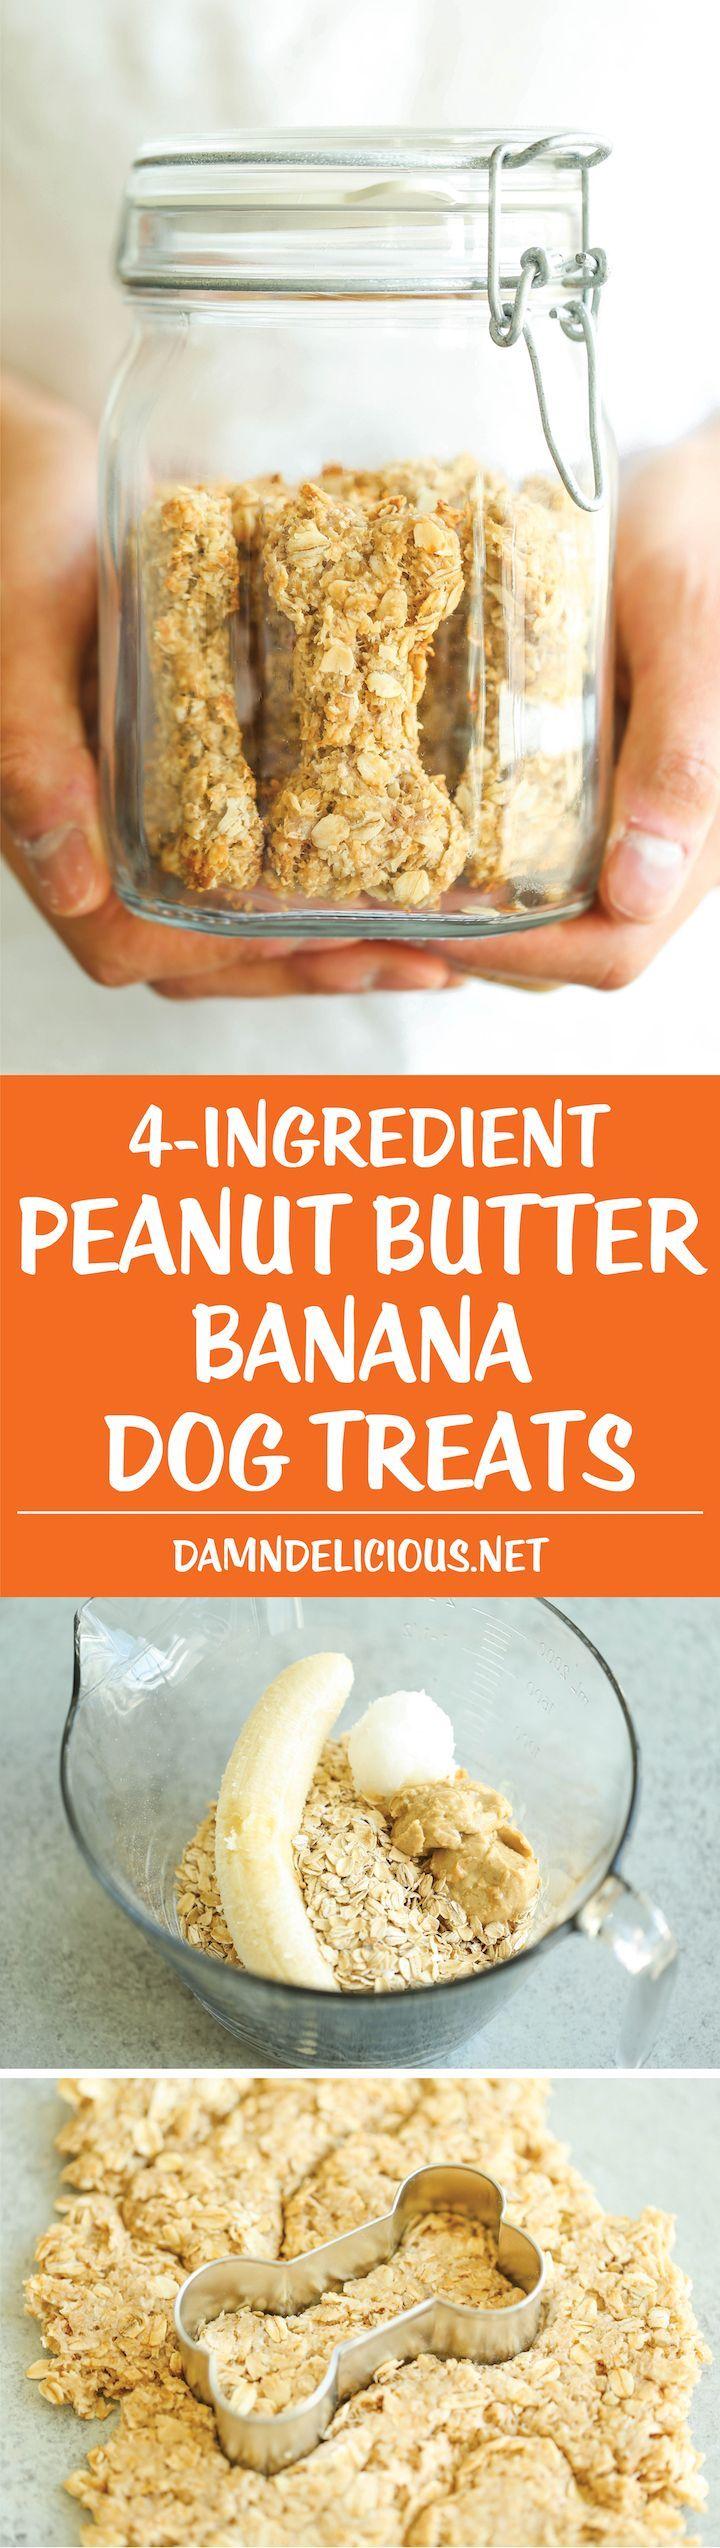 Http Damndelicious Net    Peanut Butter Banana Dog Treats